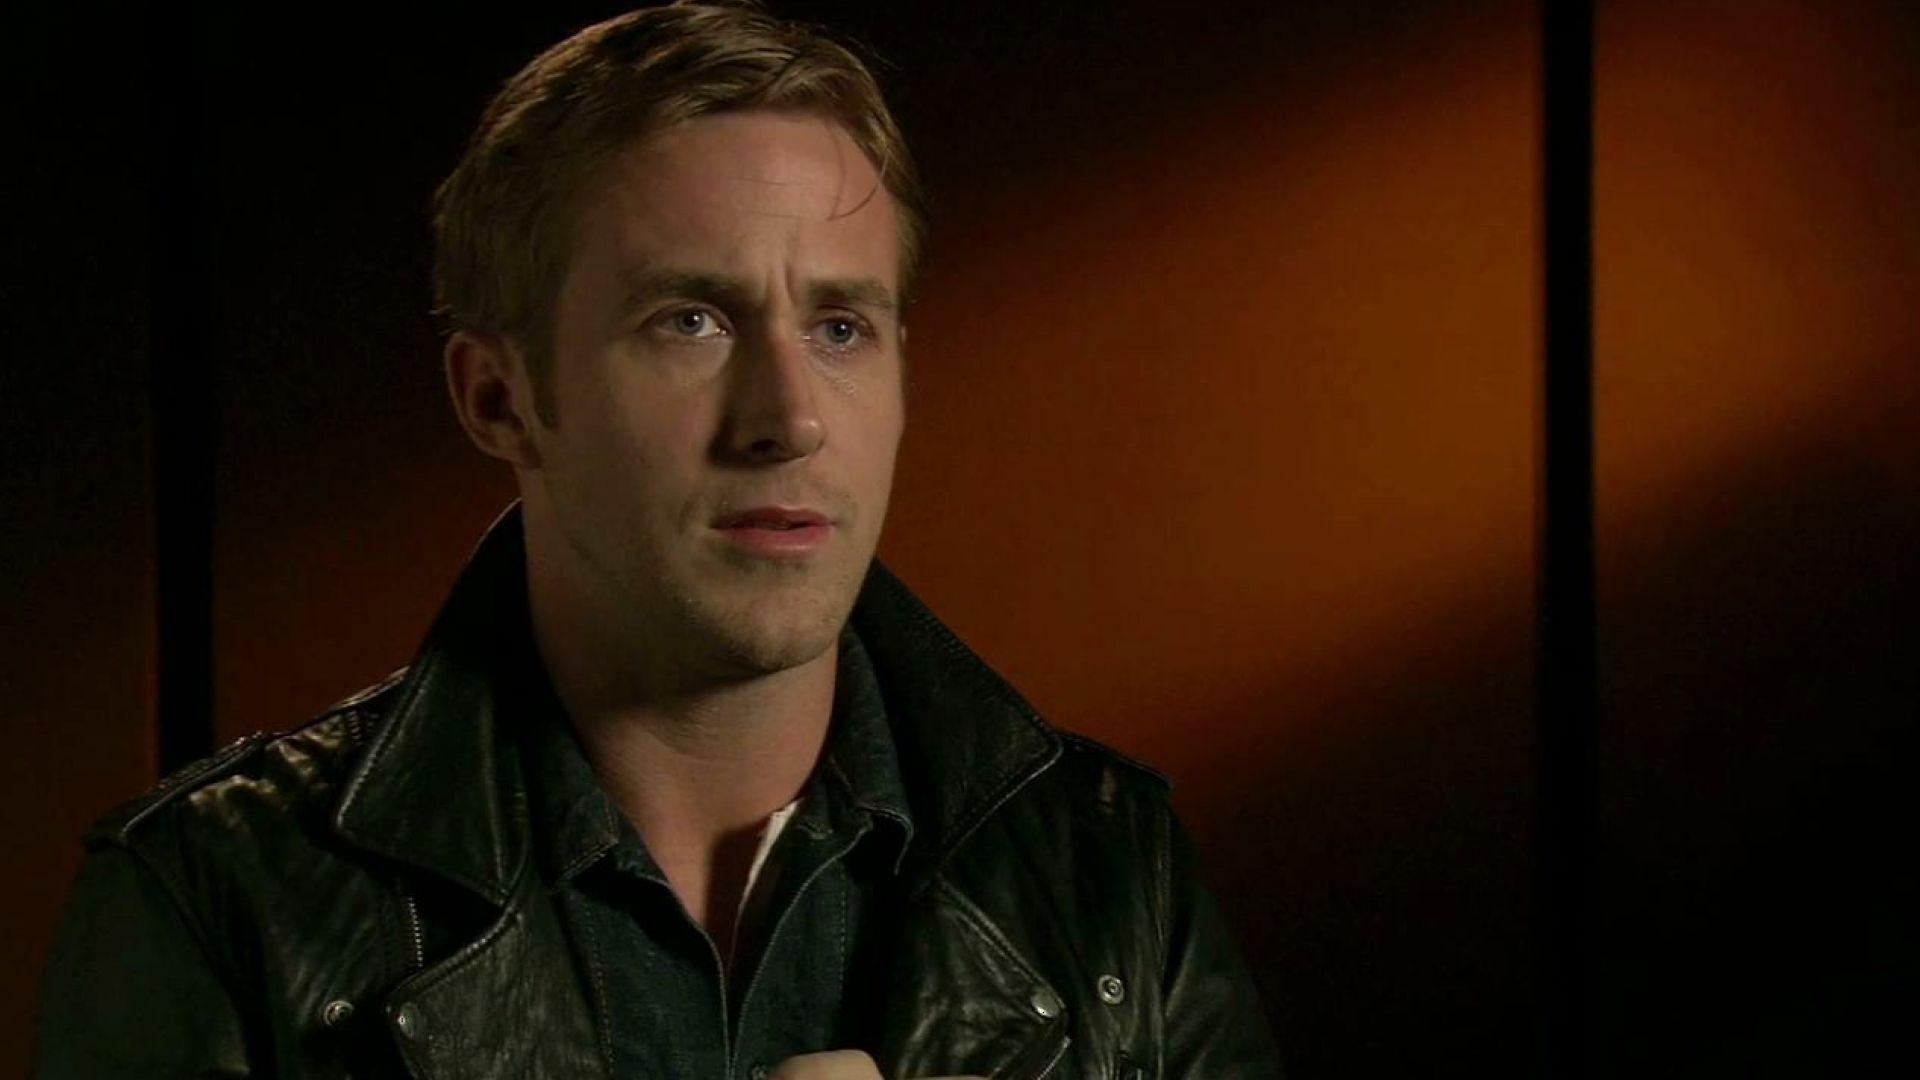 Ryan Gosling as Driver in Drive